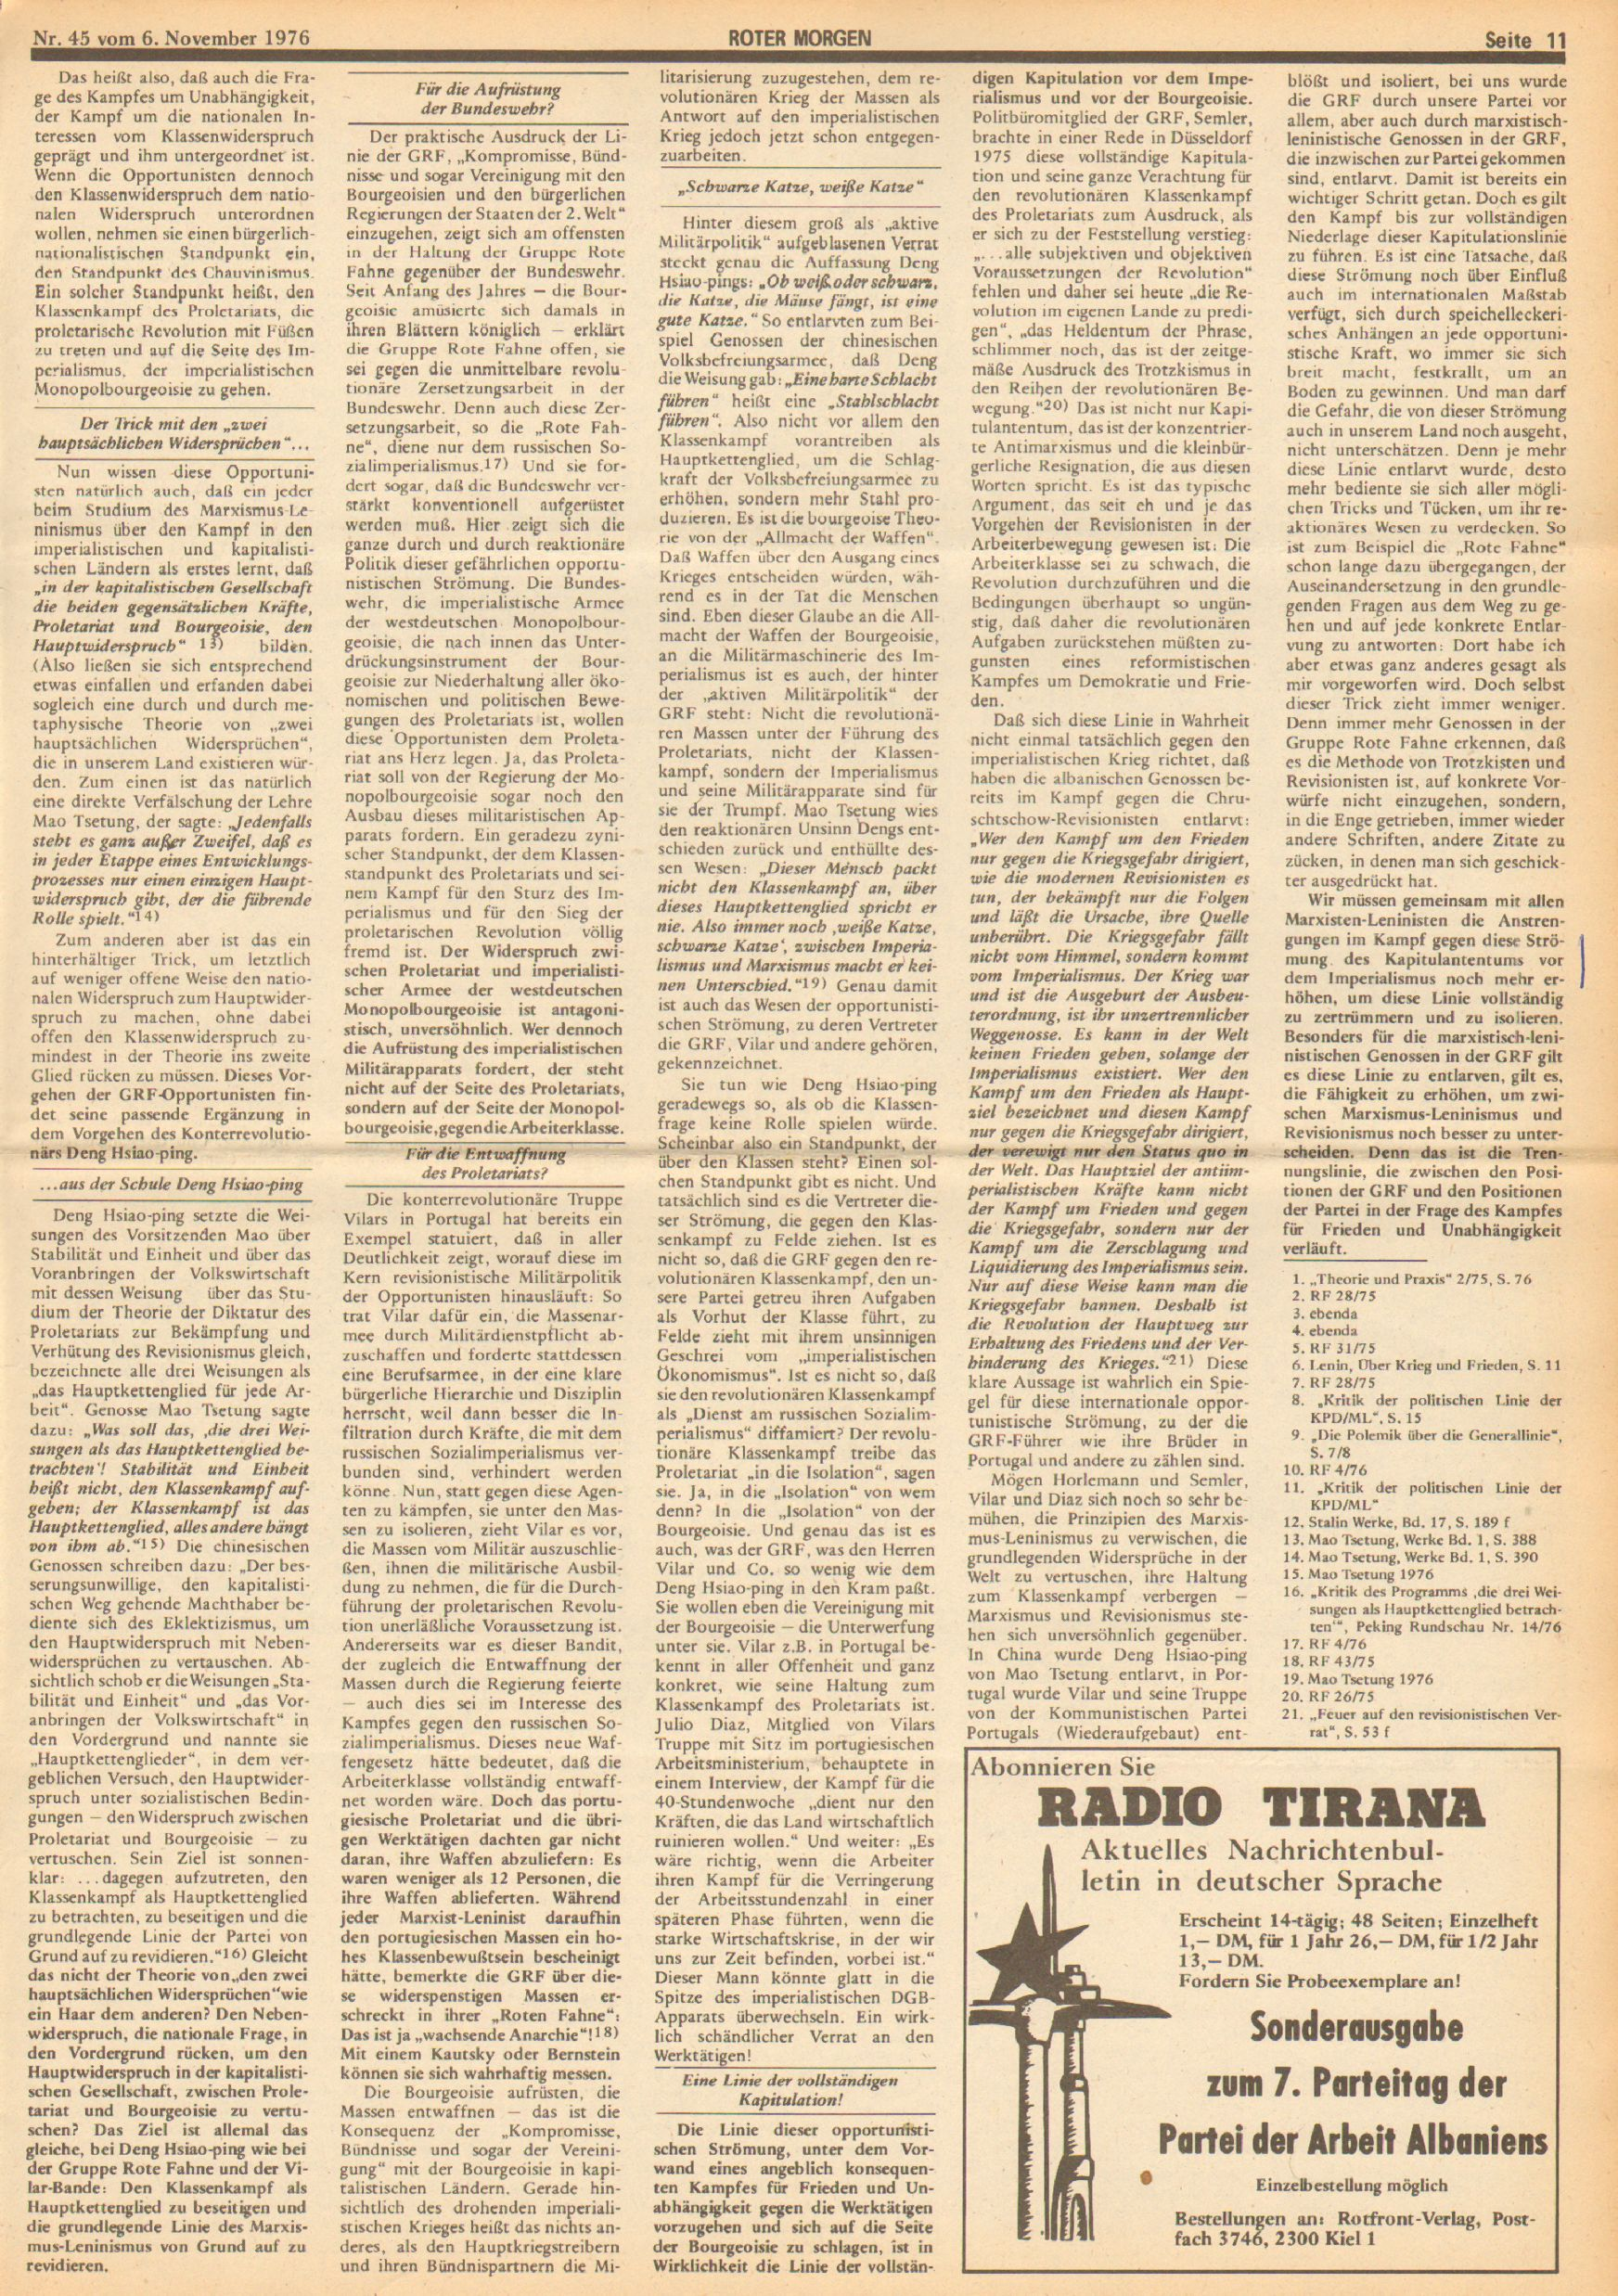 Roter Morgen, 10. Jg., 6. November 1976, Nr. 45, Seite 11